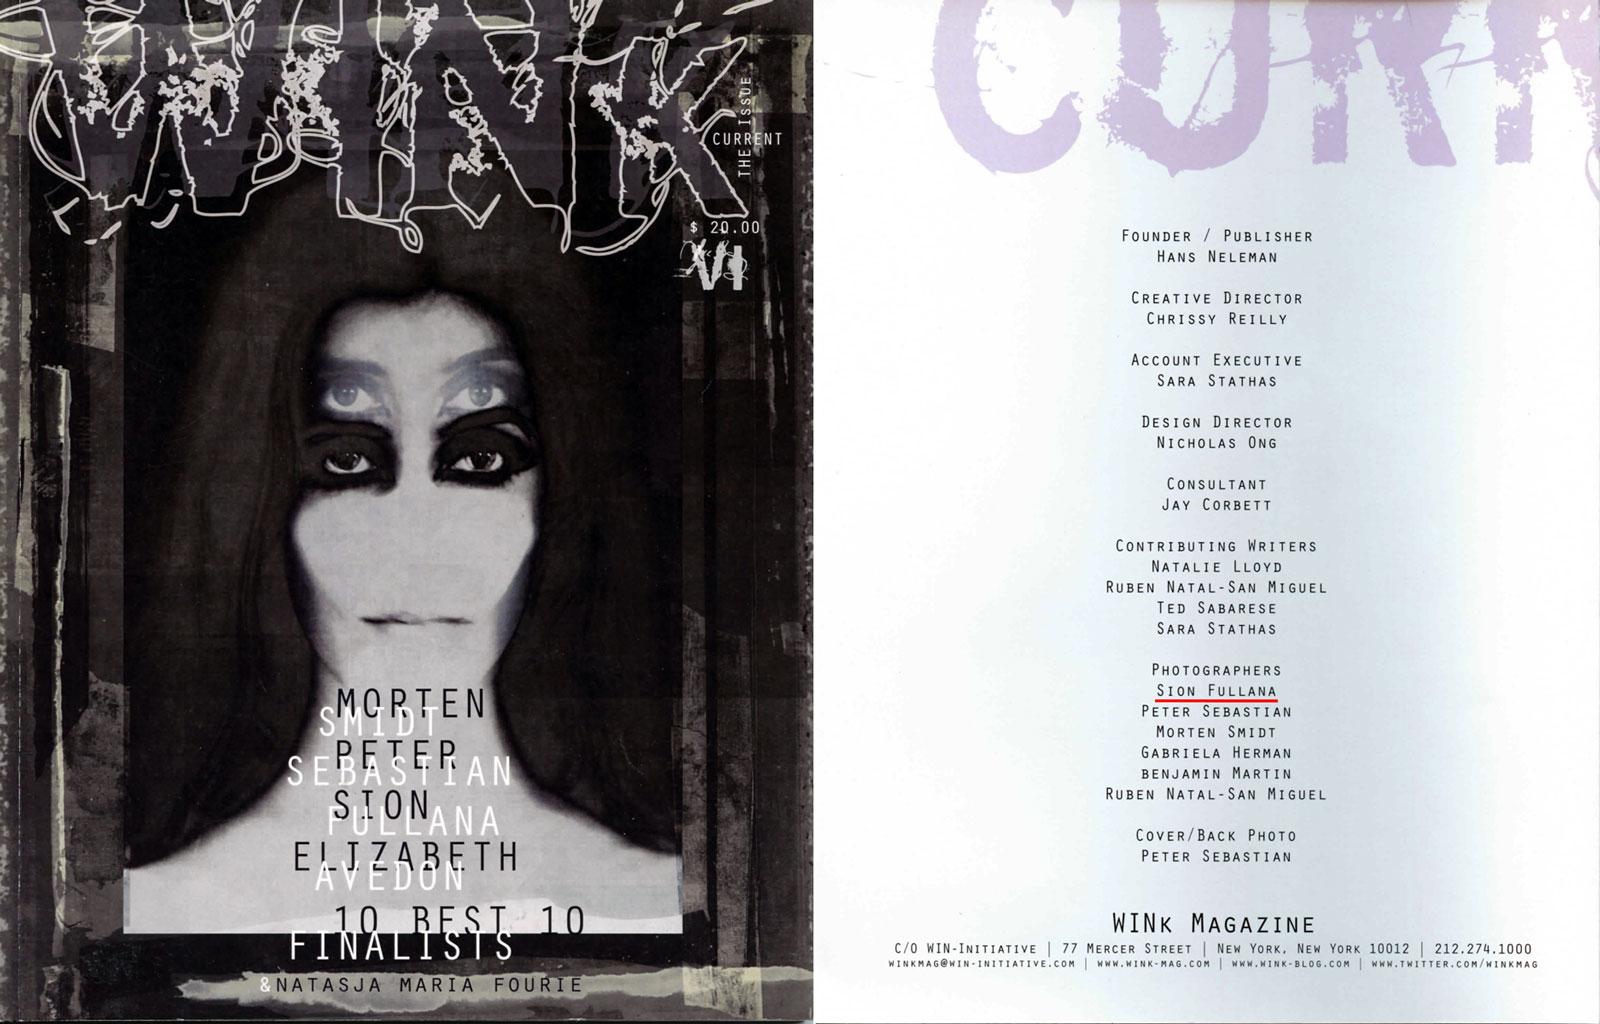 Wink-Magazine-1